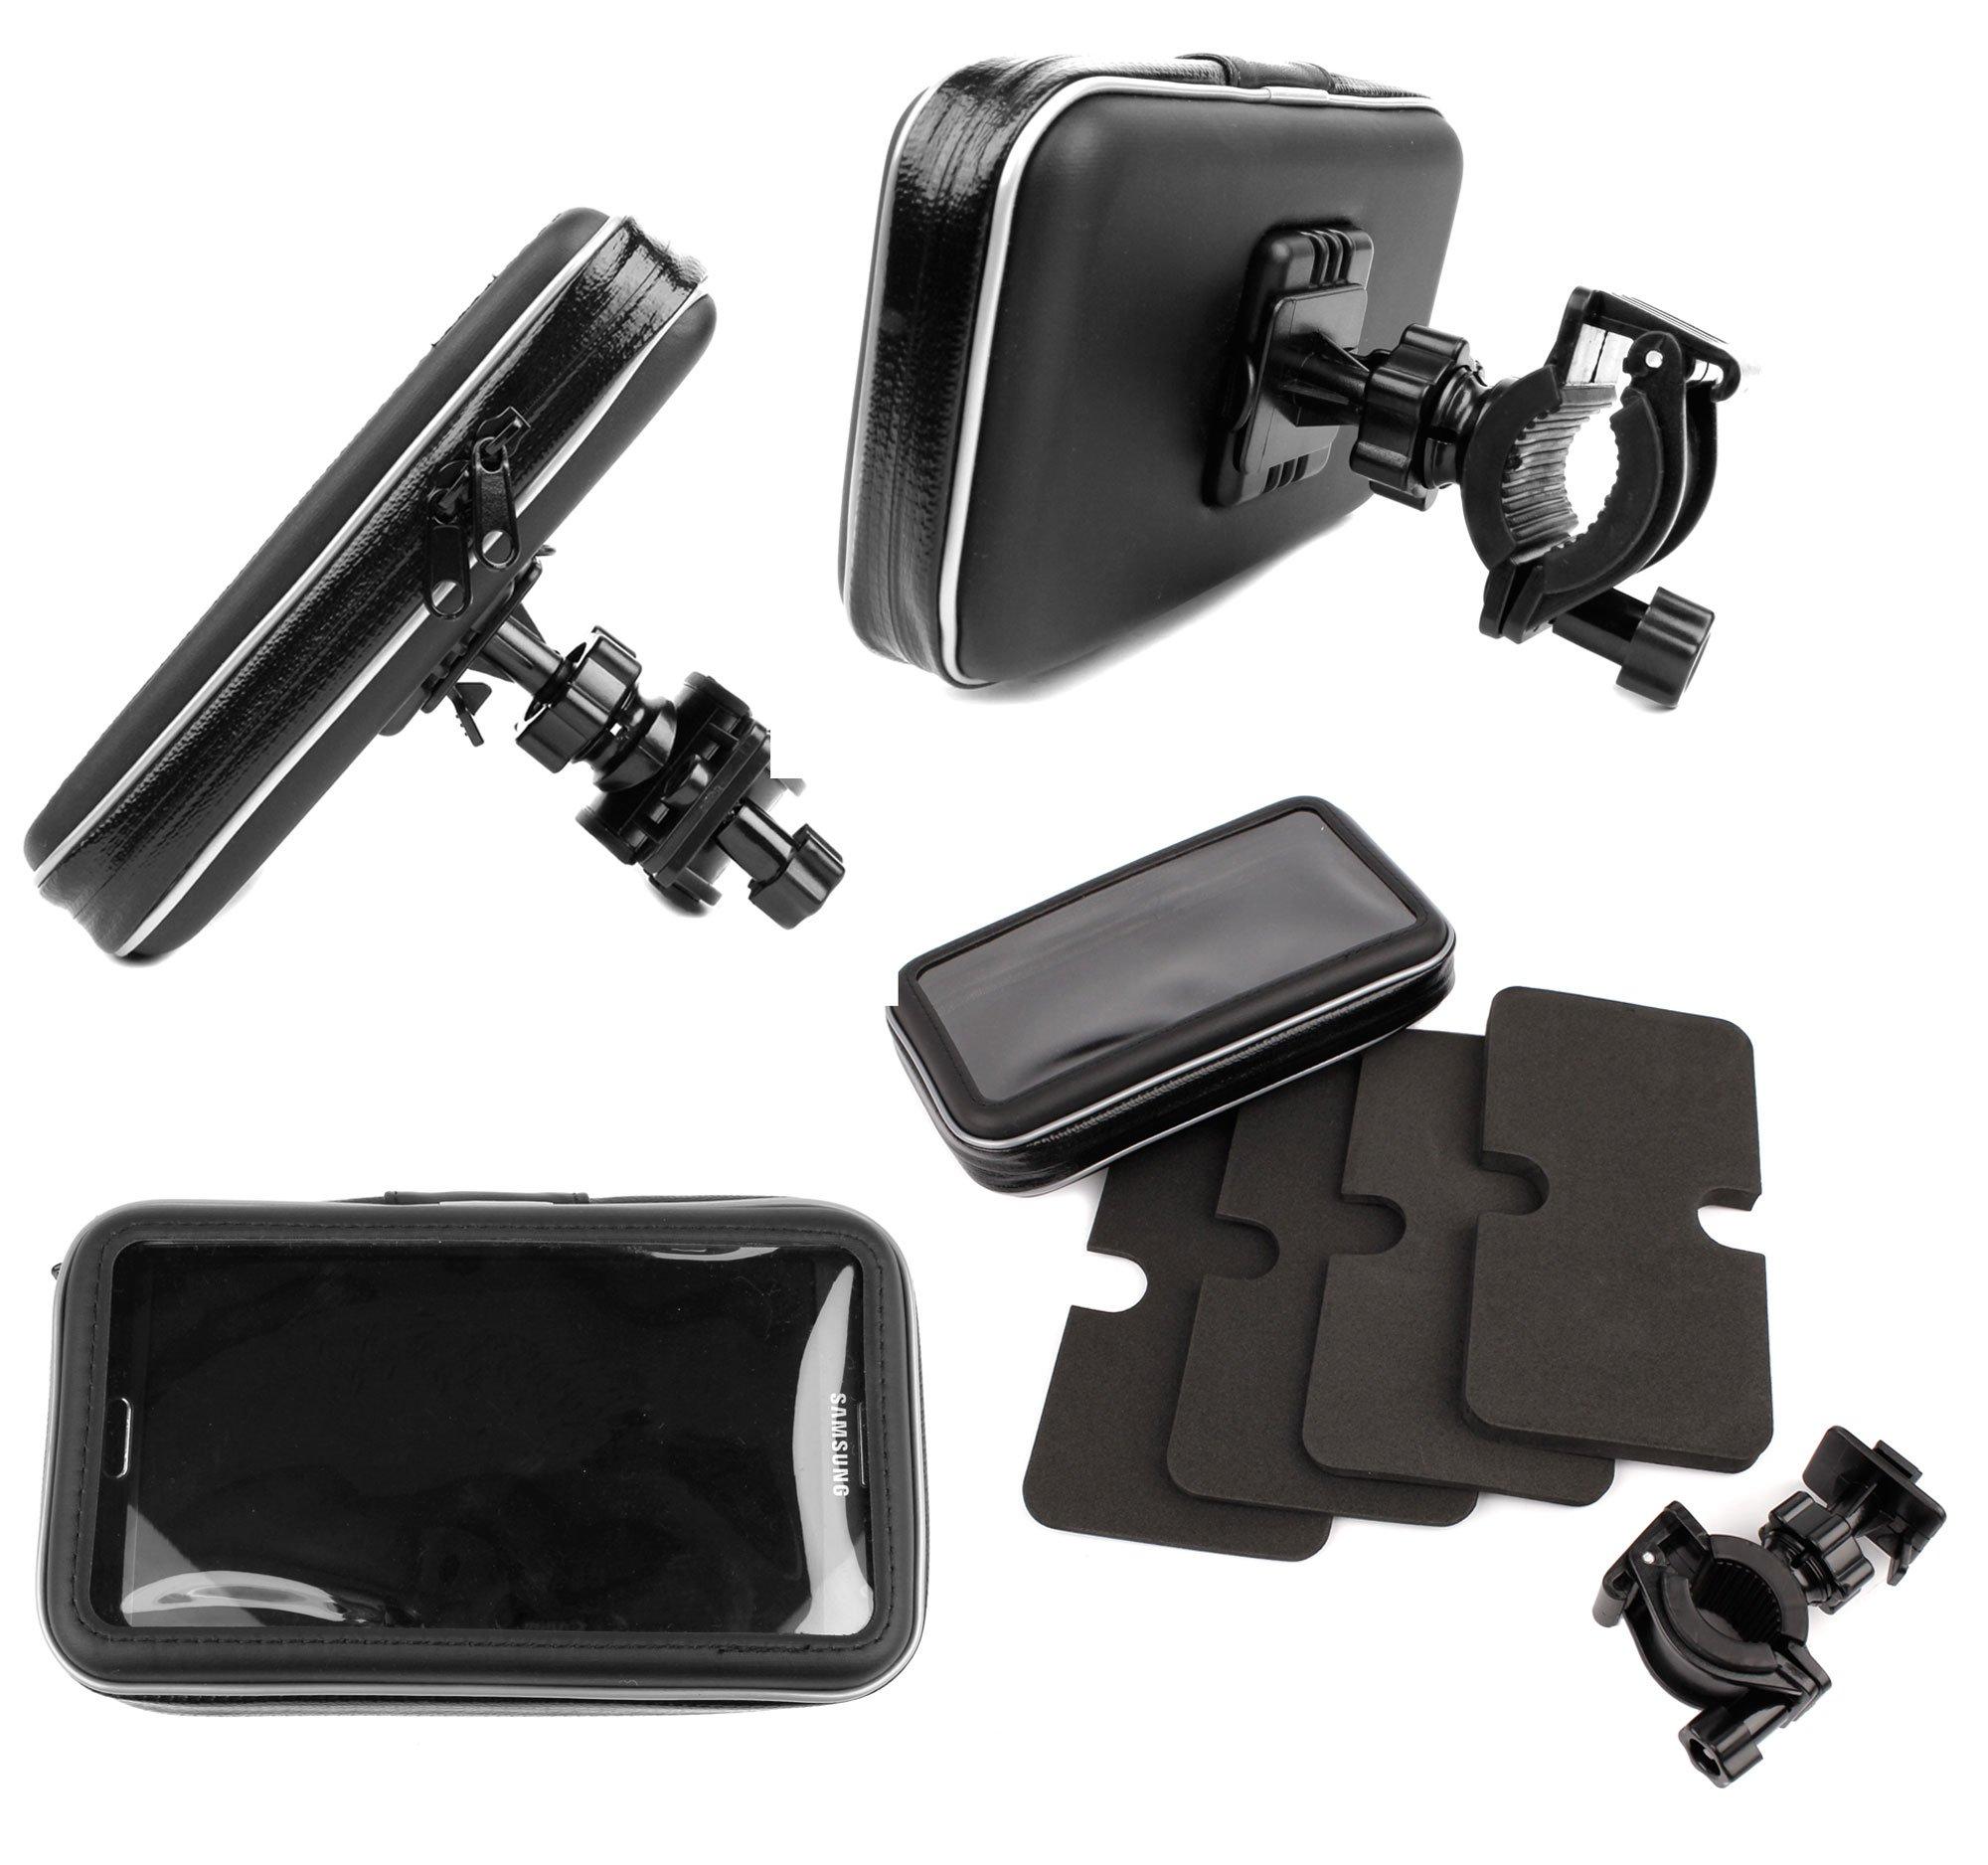 DURAGADGET Water-Resistant & Shock-Absorbing Cyclists' Satnav Case & Bike Handlebar GPS Mount - Compatible with Falk R300   R350   S400   S450 Satnav